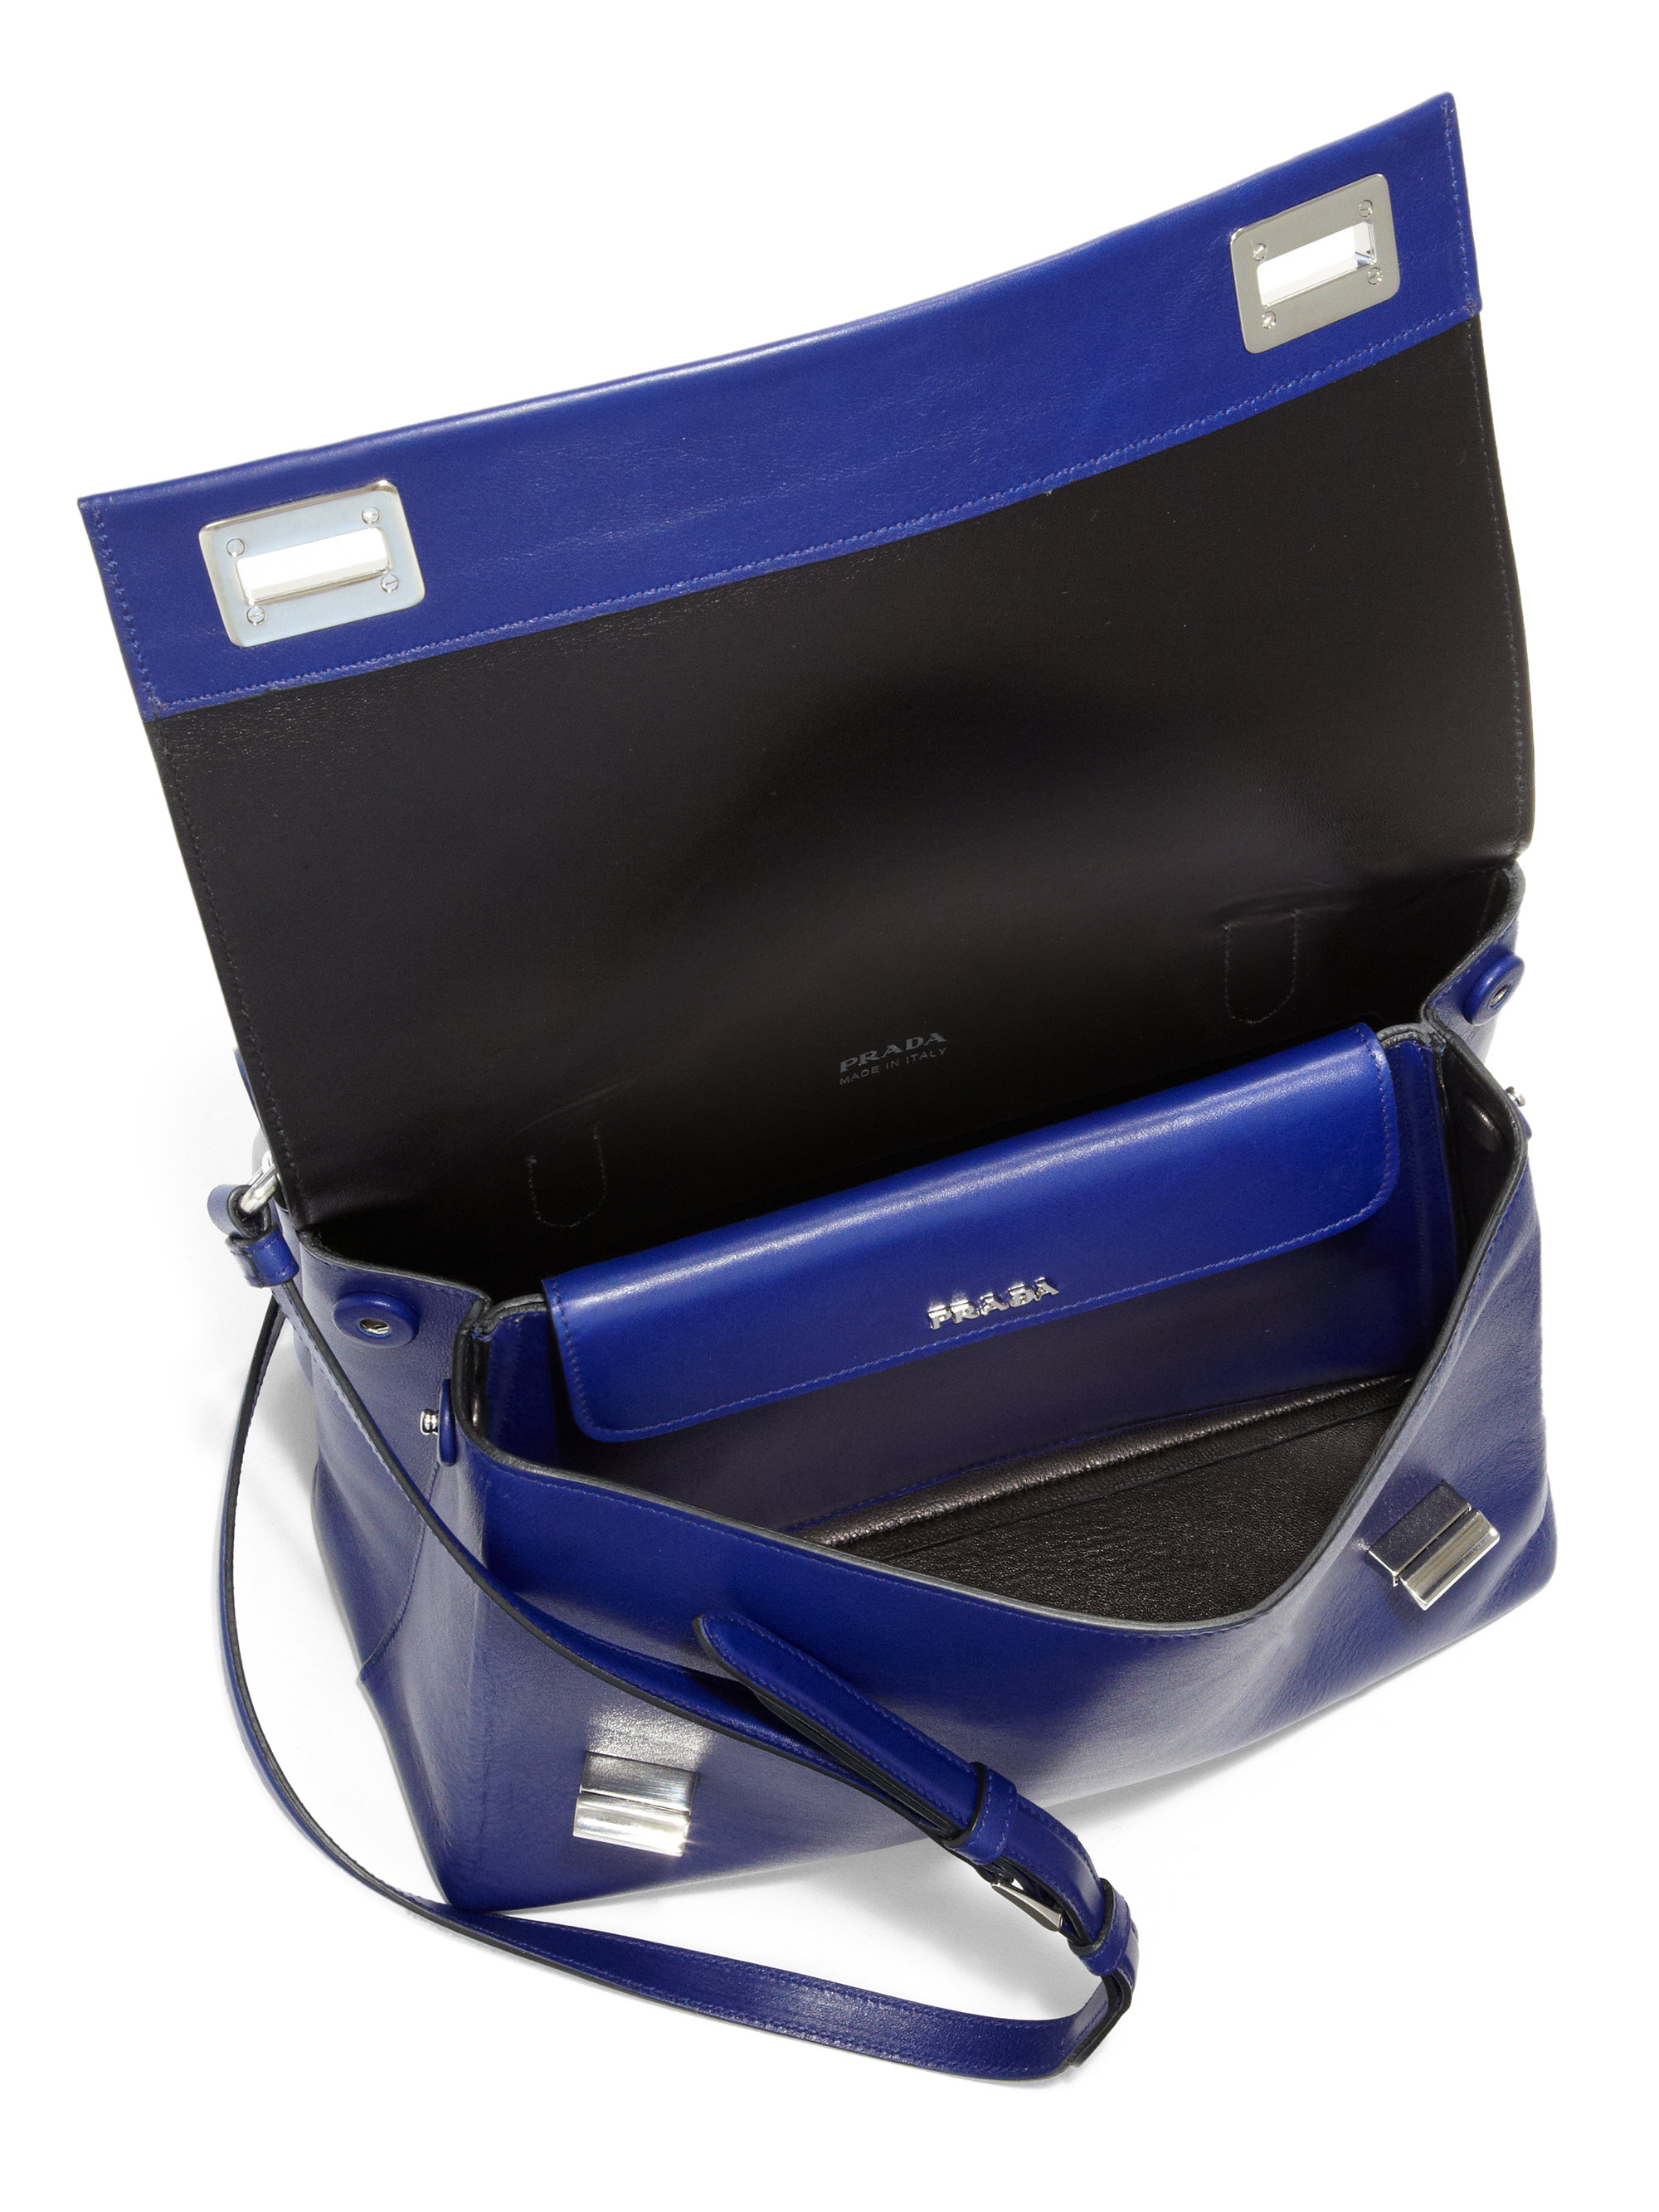 prada ayers double bag womens prada portefeuille. Black Bedroom Furniture Sets. Home Design Ideas